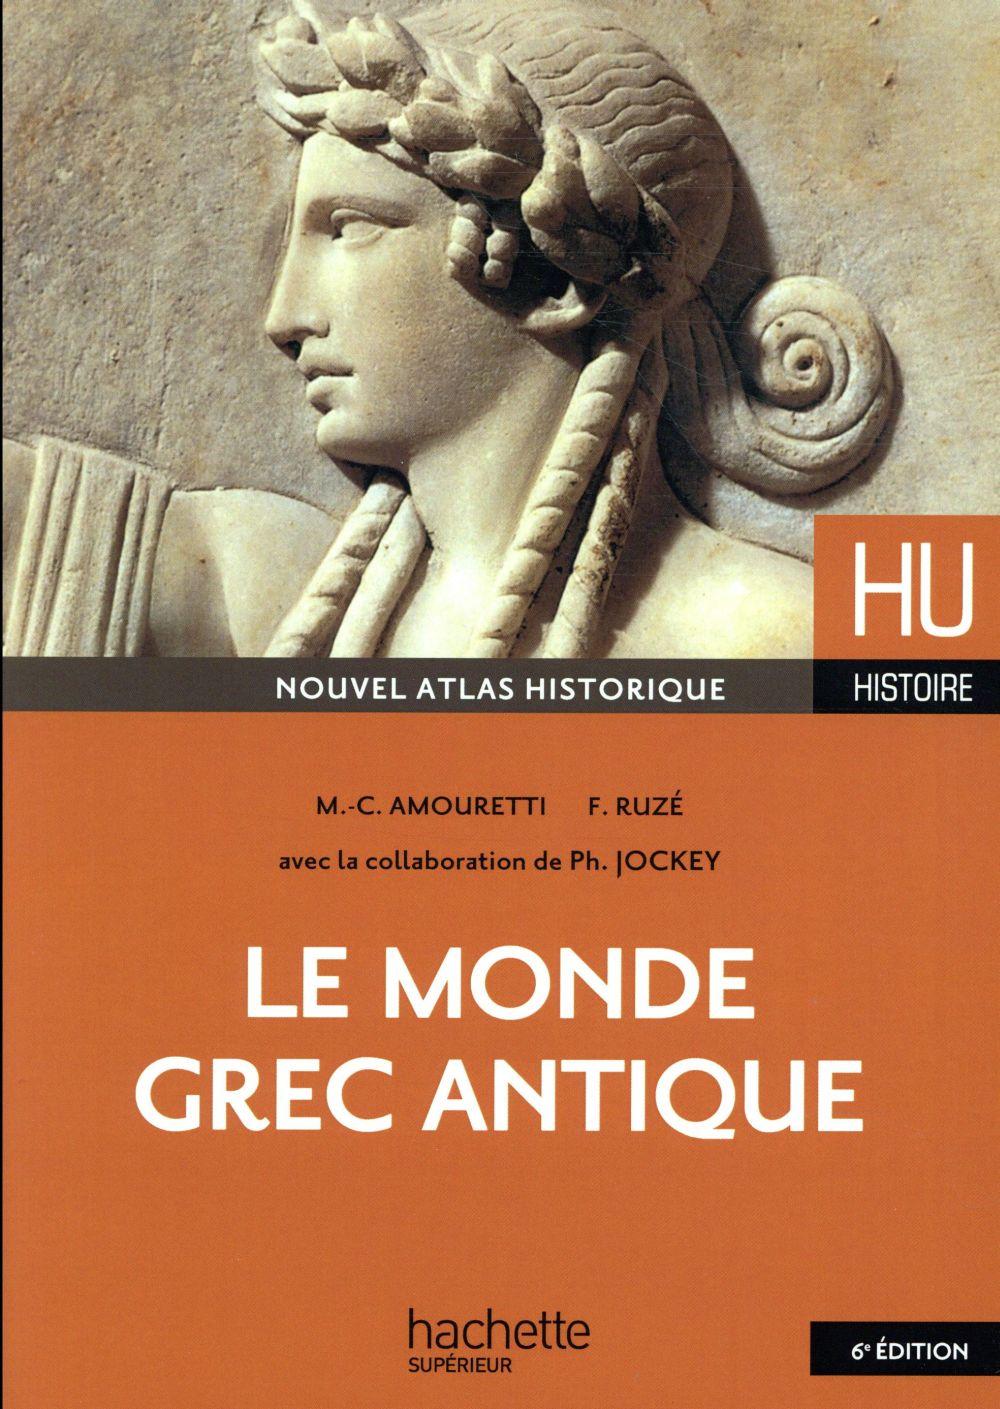 HU HISTOIRE  -  LE MONDE GREC ANTIQUE AMOURETTI M-C. HACHETTE